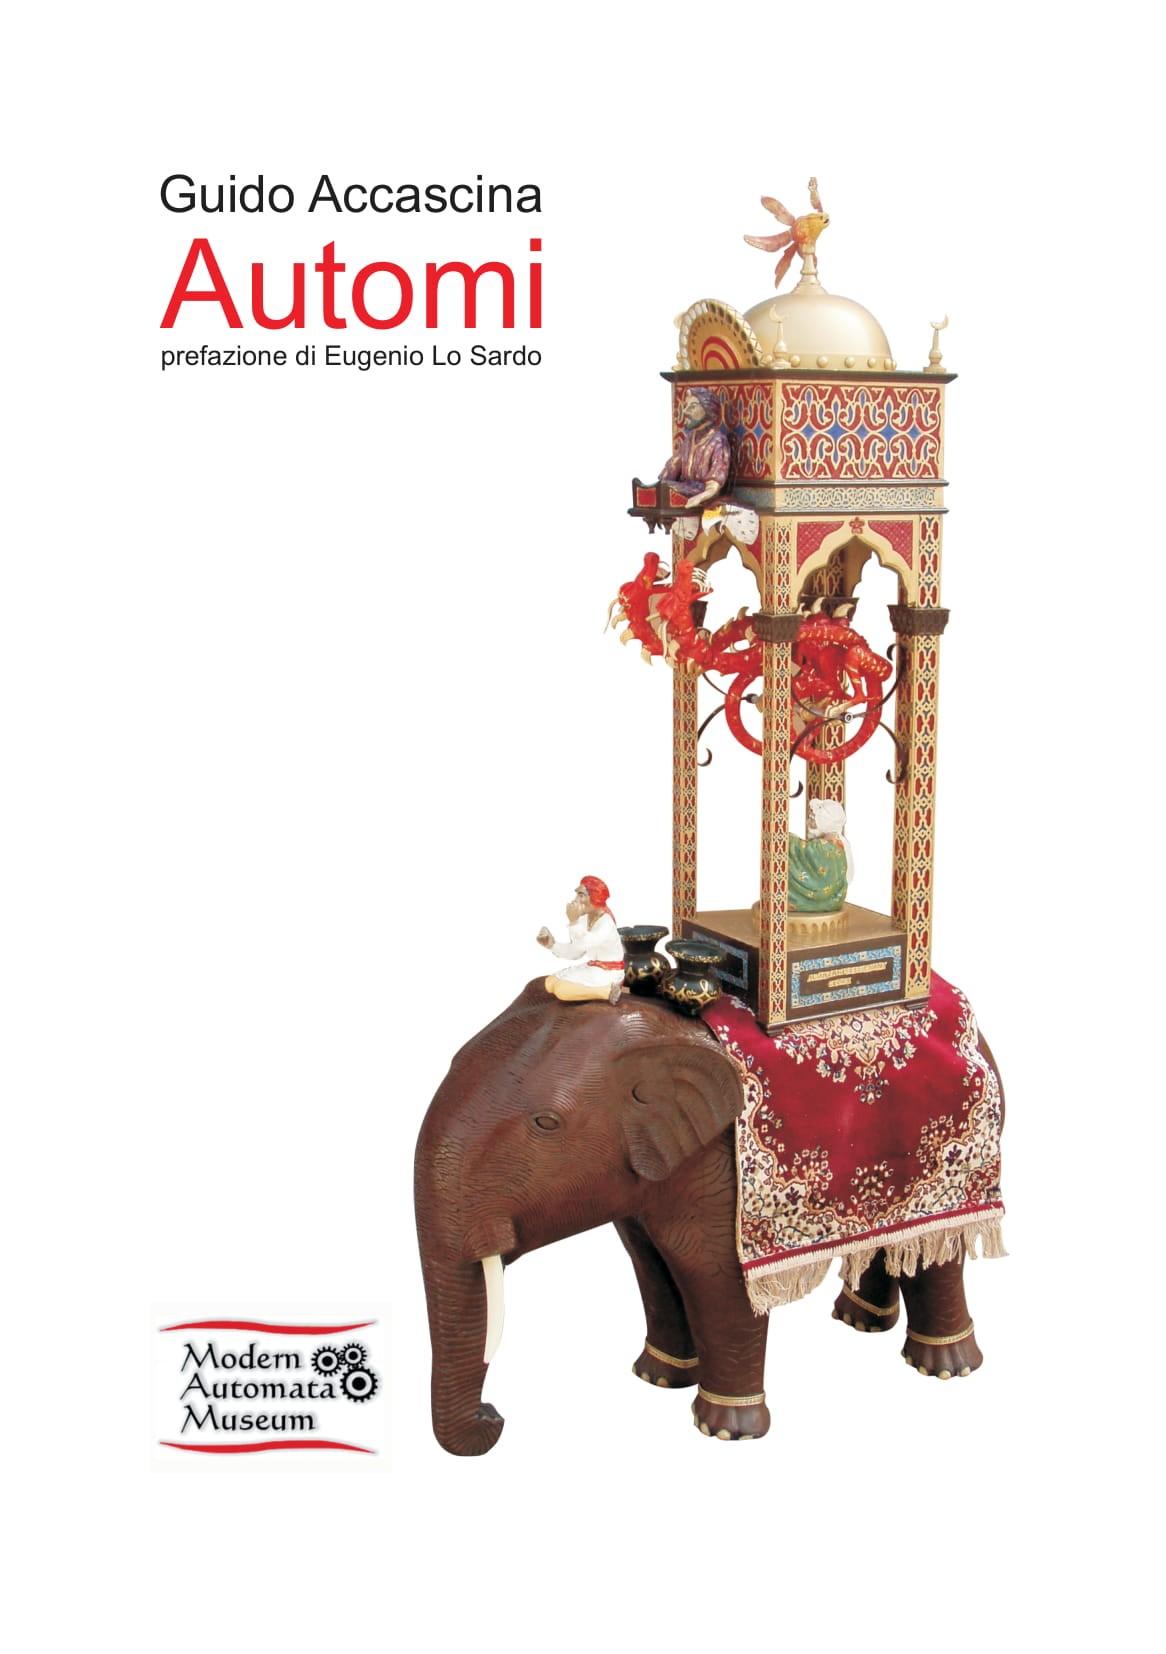 a-00-libro-copertina-museo-finale-accascina.jpg - 211.03 kB